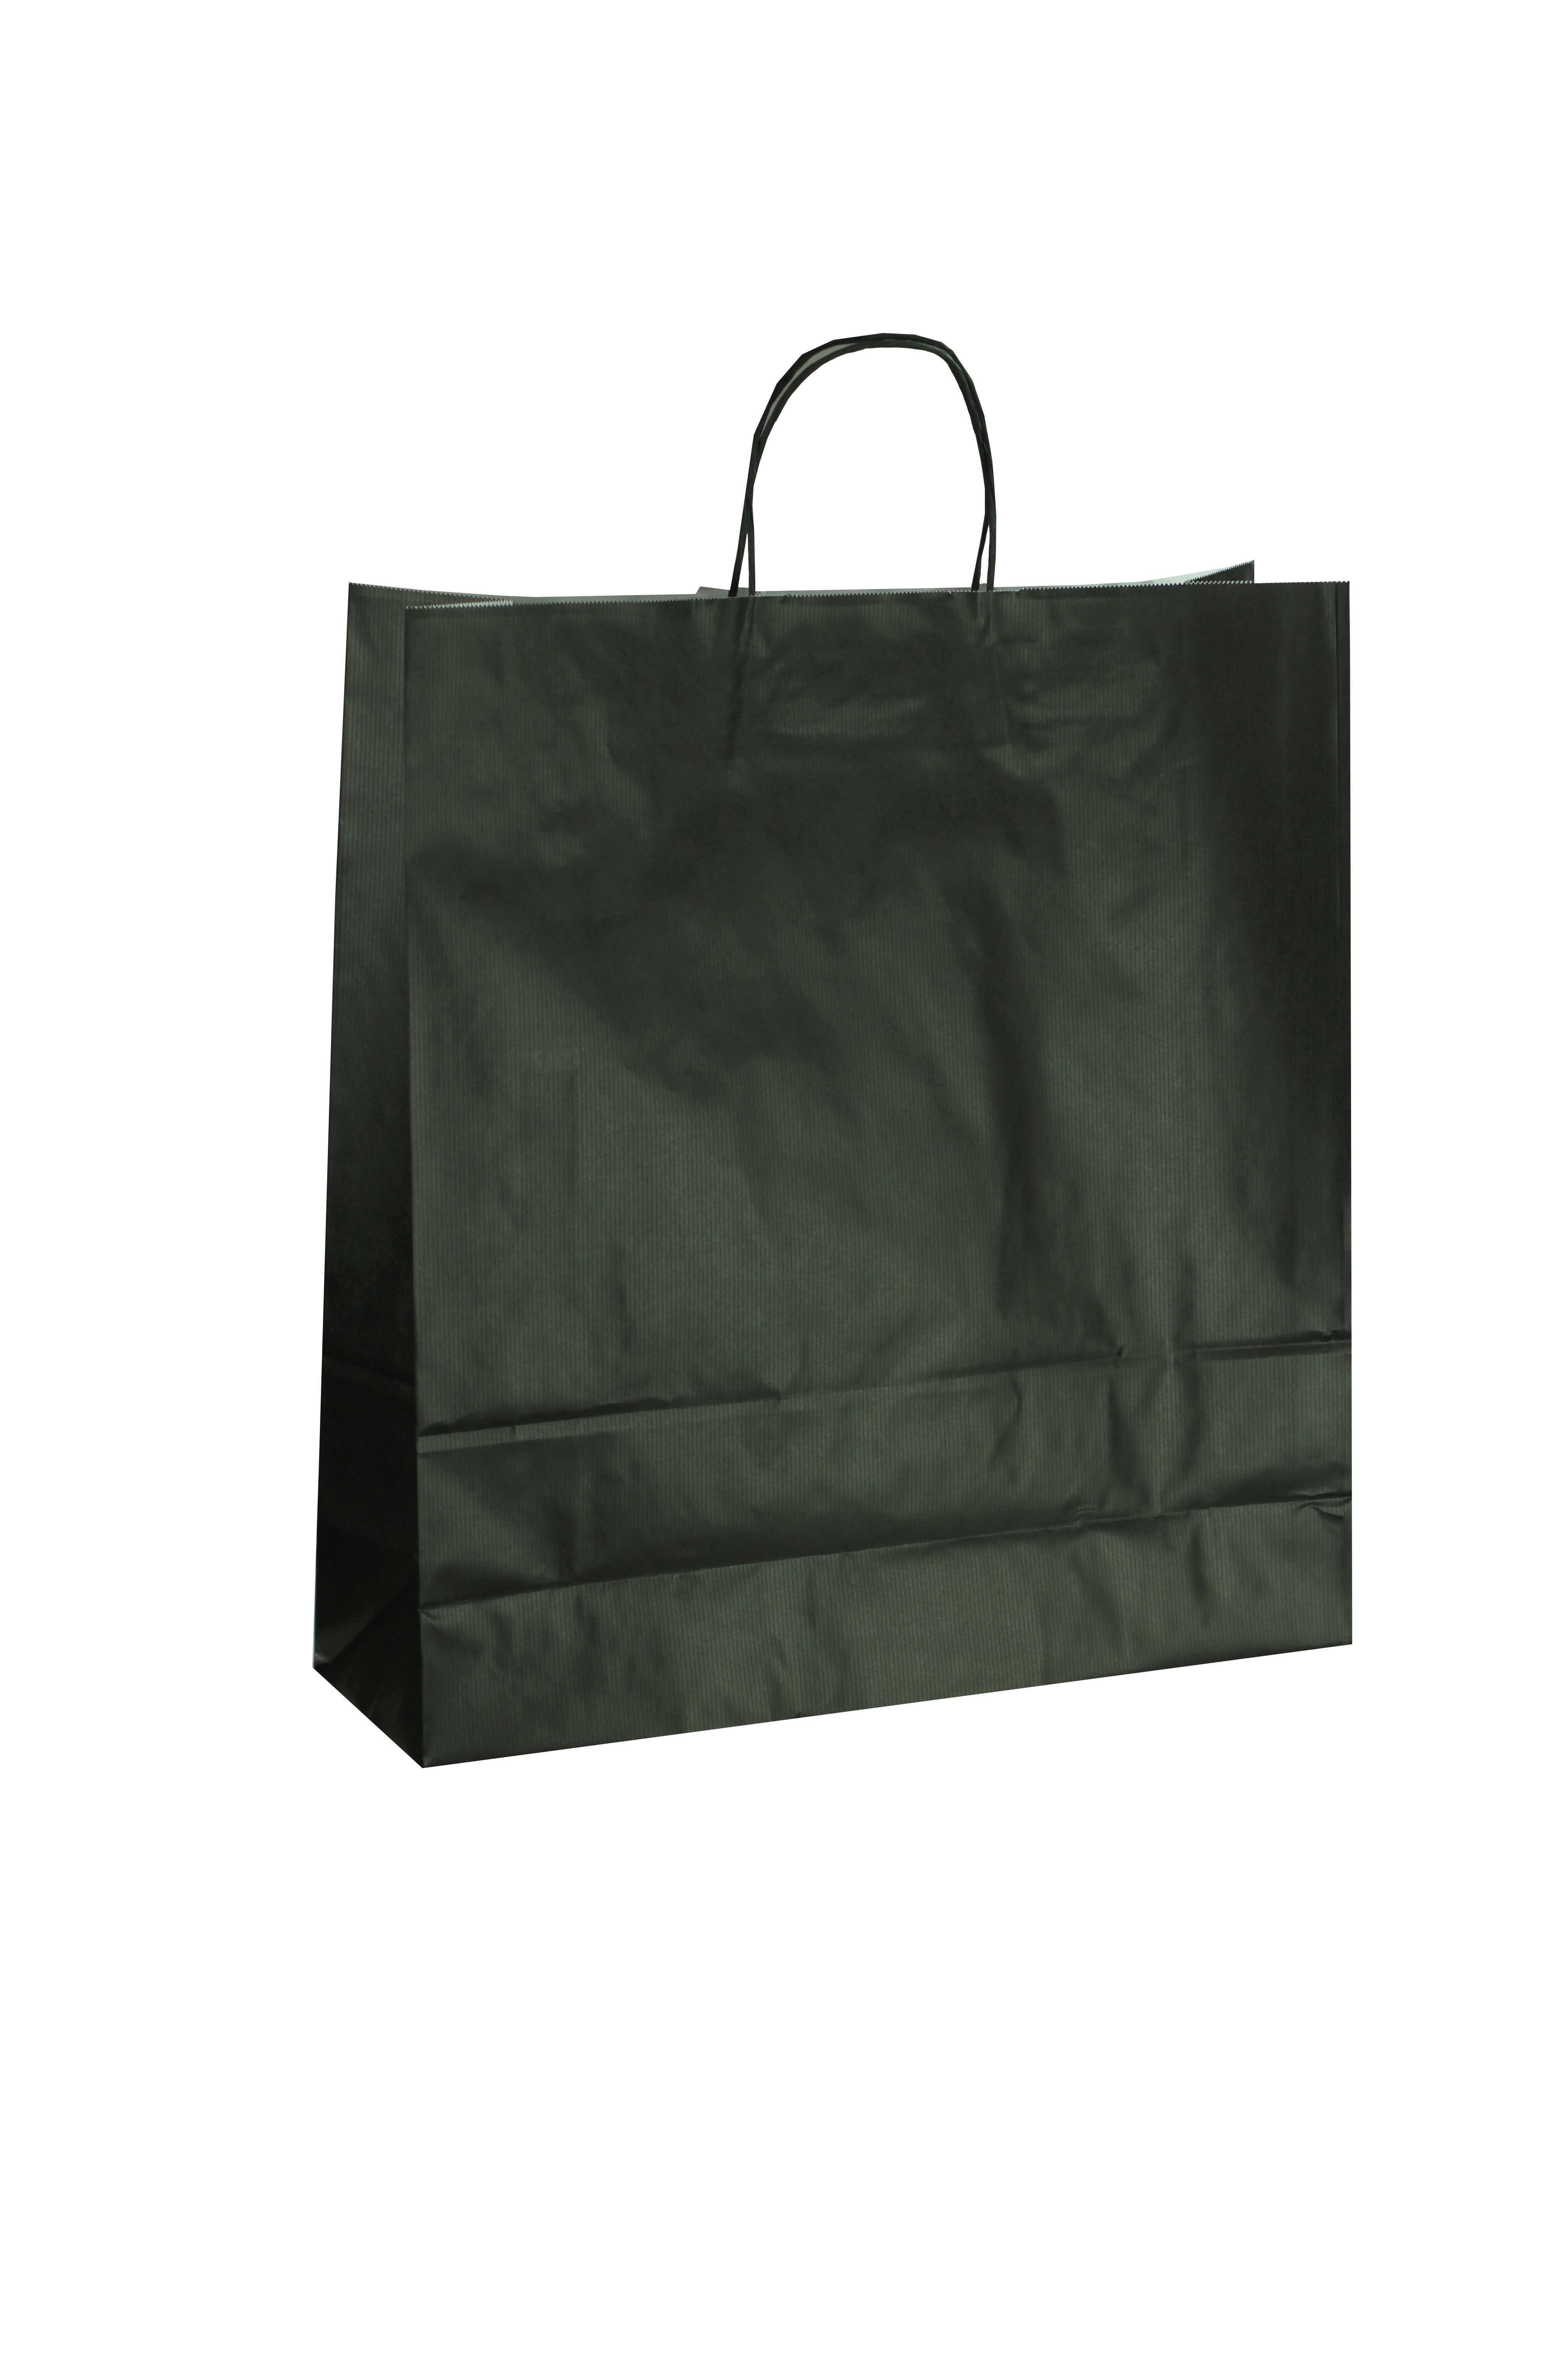 f769938fa Bolsa de papel celulosa asa rizada color negro 22x10x29 cm 25 unidades